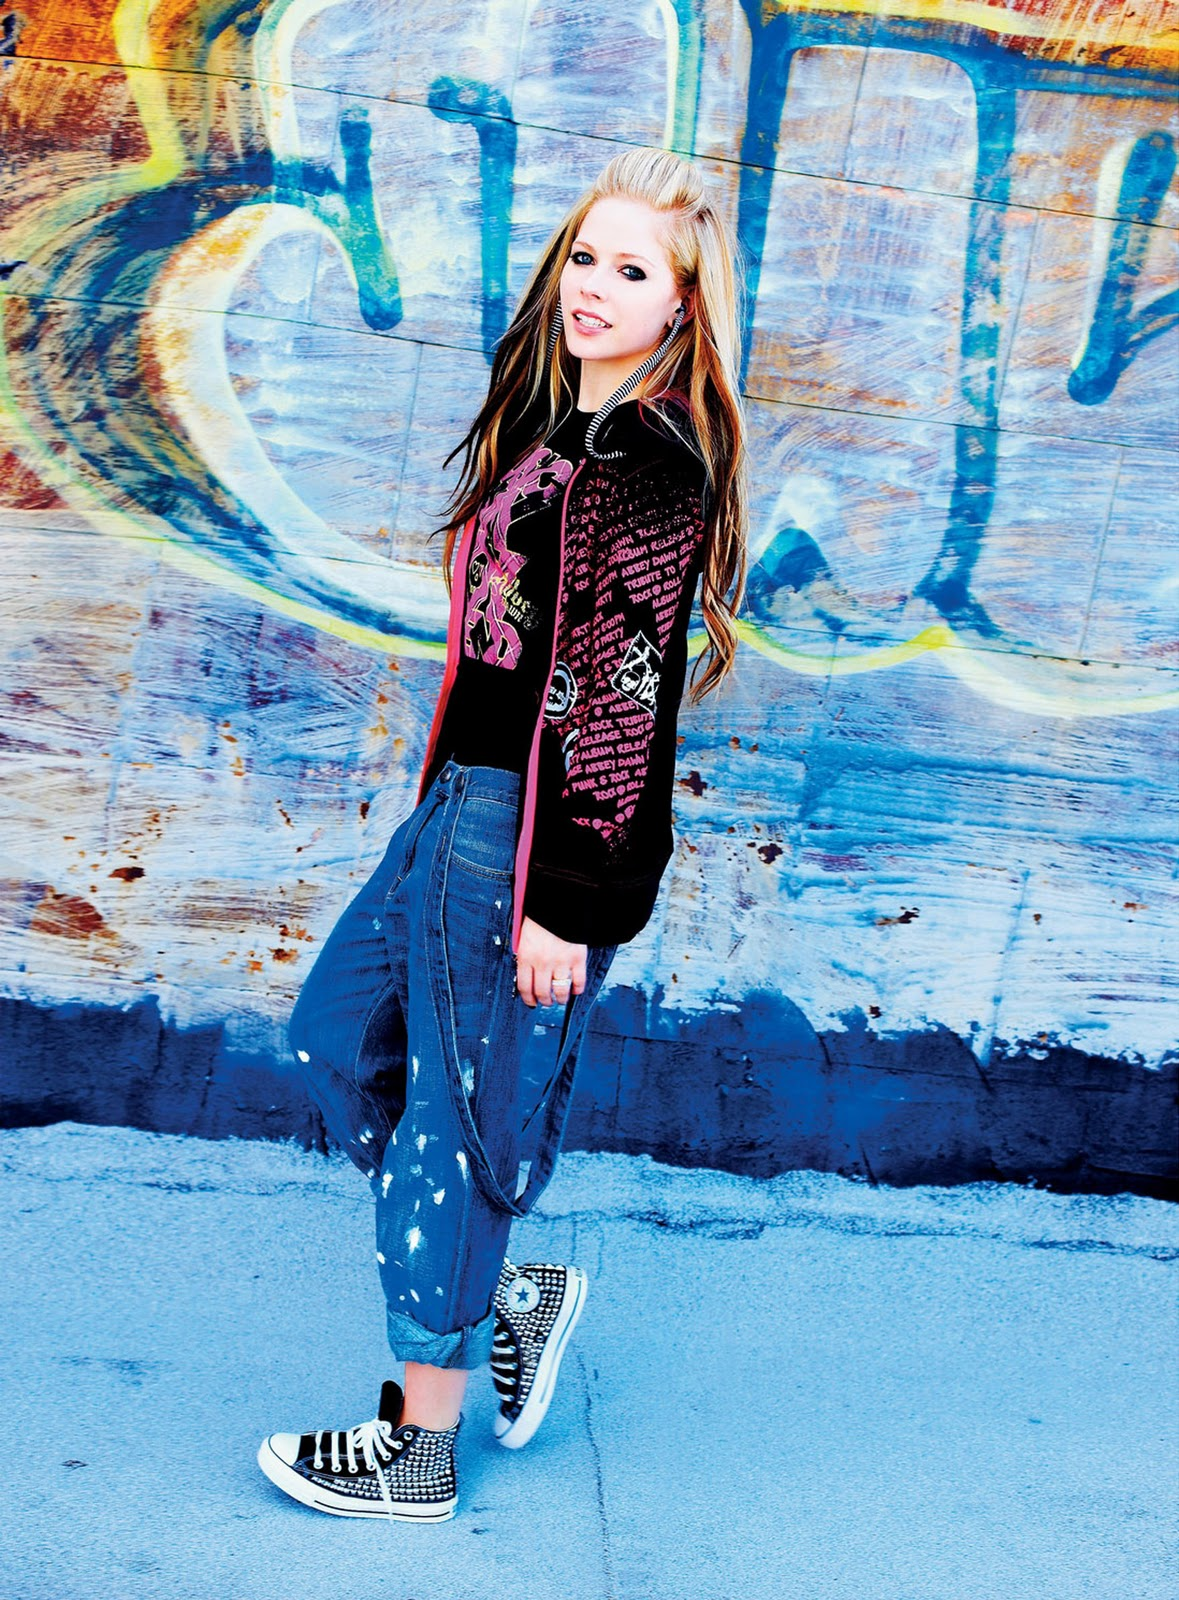 ������� ������������ avril lavigne 76903_celebrity-paradise.com-The_Elder-Avril_Lavigne_-_Abbey_Dawn_Clothing_Line_Shoot_2010_122_214lo.jpg